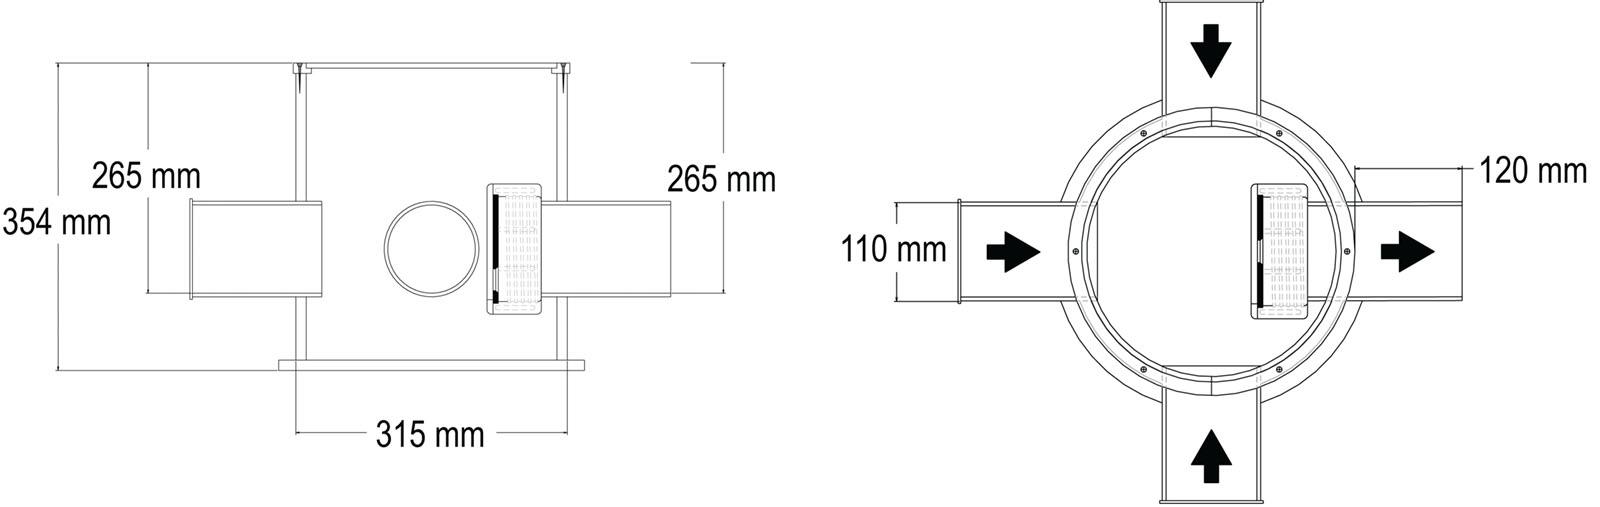 Controflow_SUDS01001_dimensions